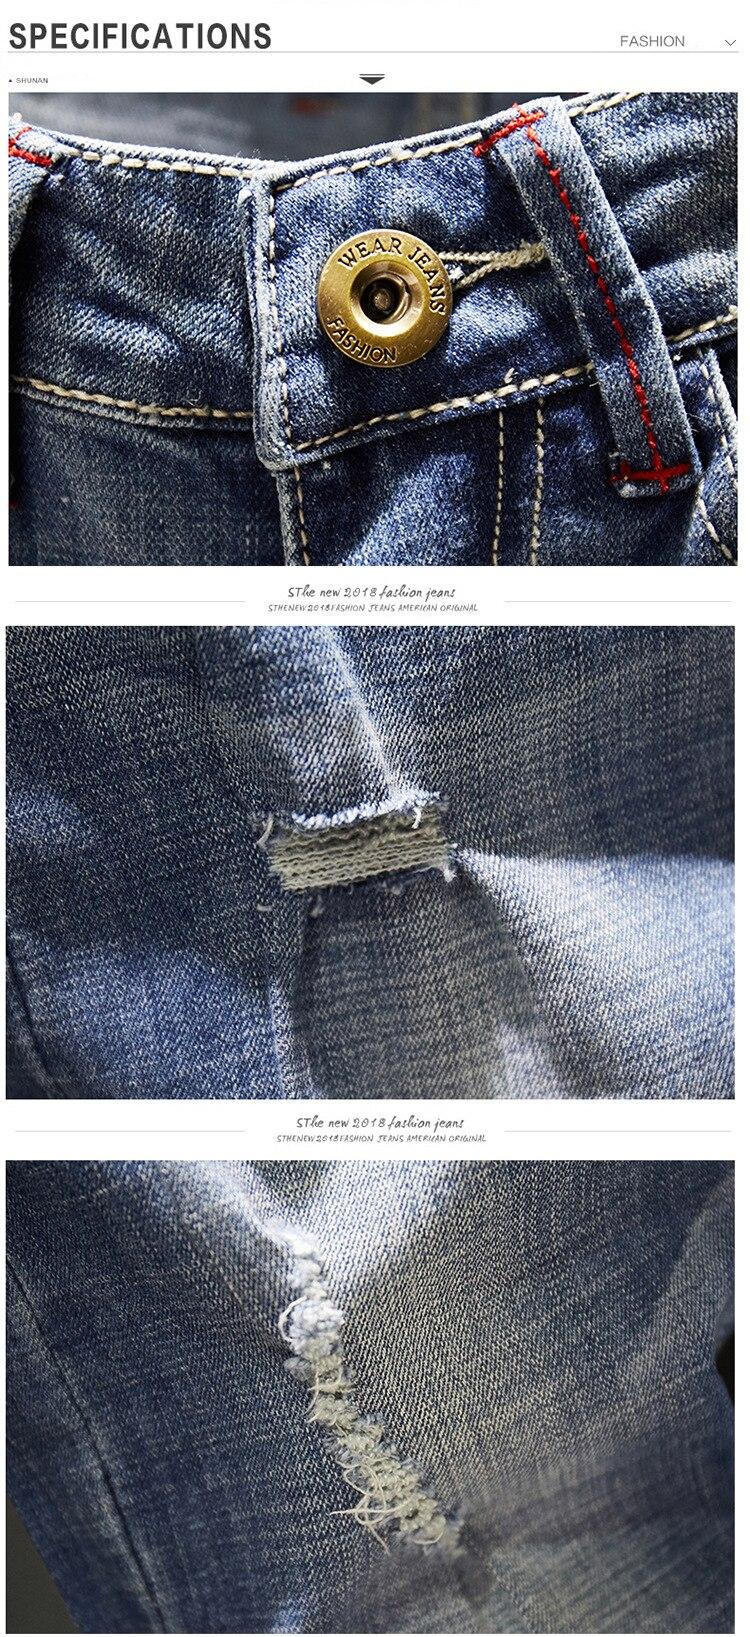 KSTUN Biker Jeans Men Ripped Slim Fit Light Blue Stretch Fashion 2020 Streetwear Frayed Hip Hop Distressed Denim Jeans Pants Man 12